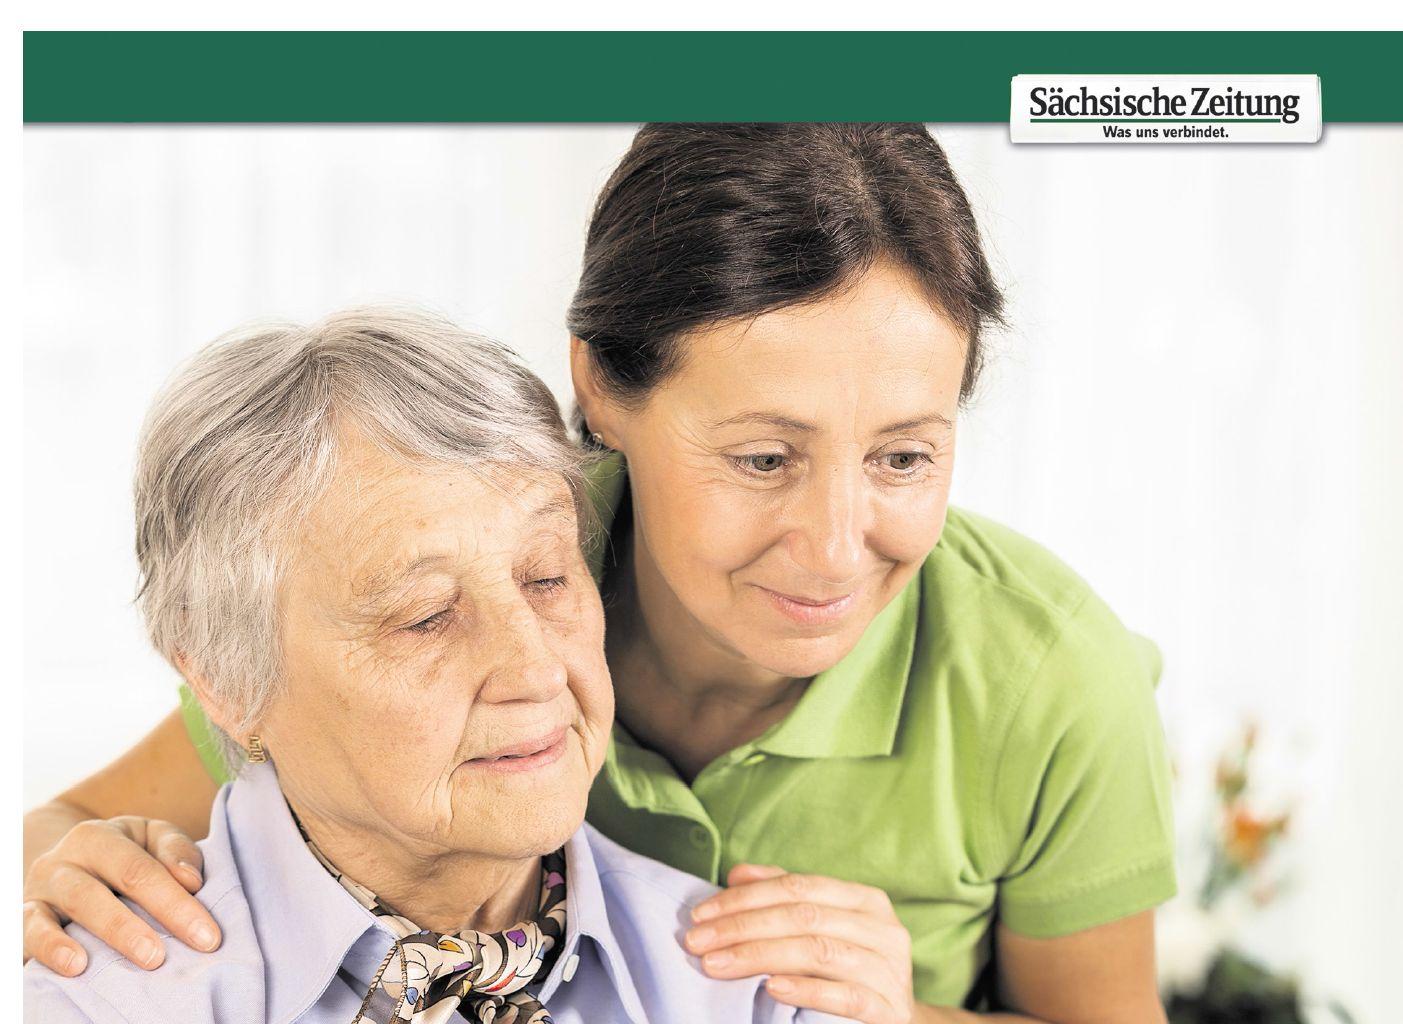 Der Pflegekompass der SZ. (Foto: Sächsische Zeitung / FredFroese | Grafik: www.fotolia.com © macrovector | DRS)